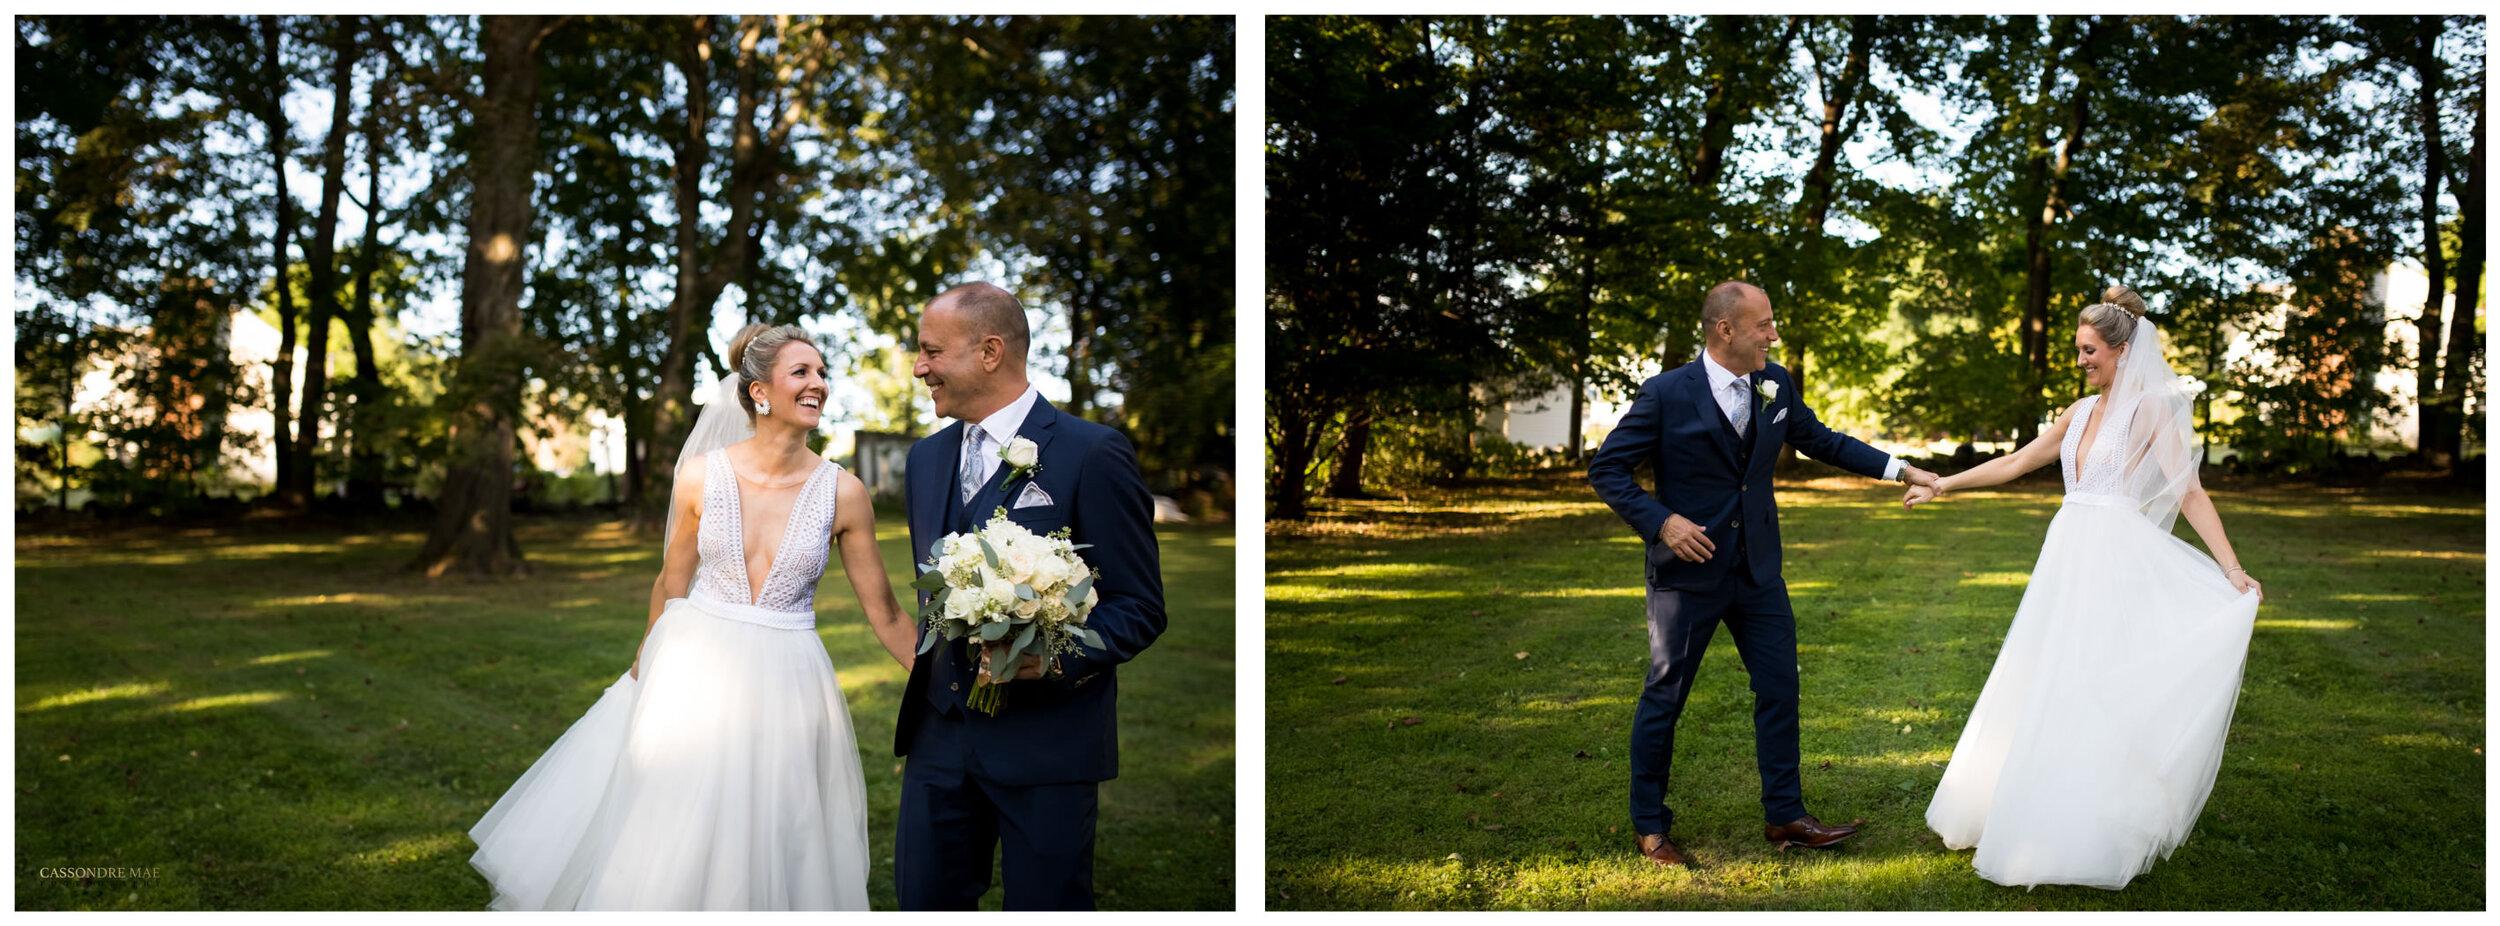 Cassondre Mae Photography Briarcliff Manor Wedding Photographer 11.jpg